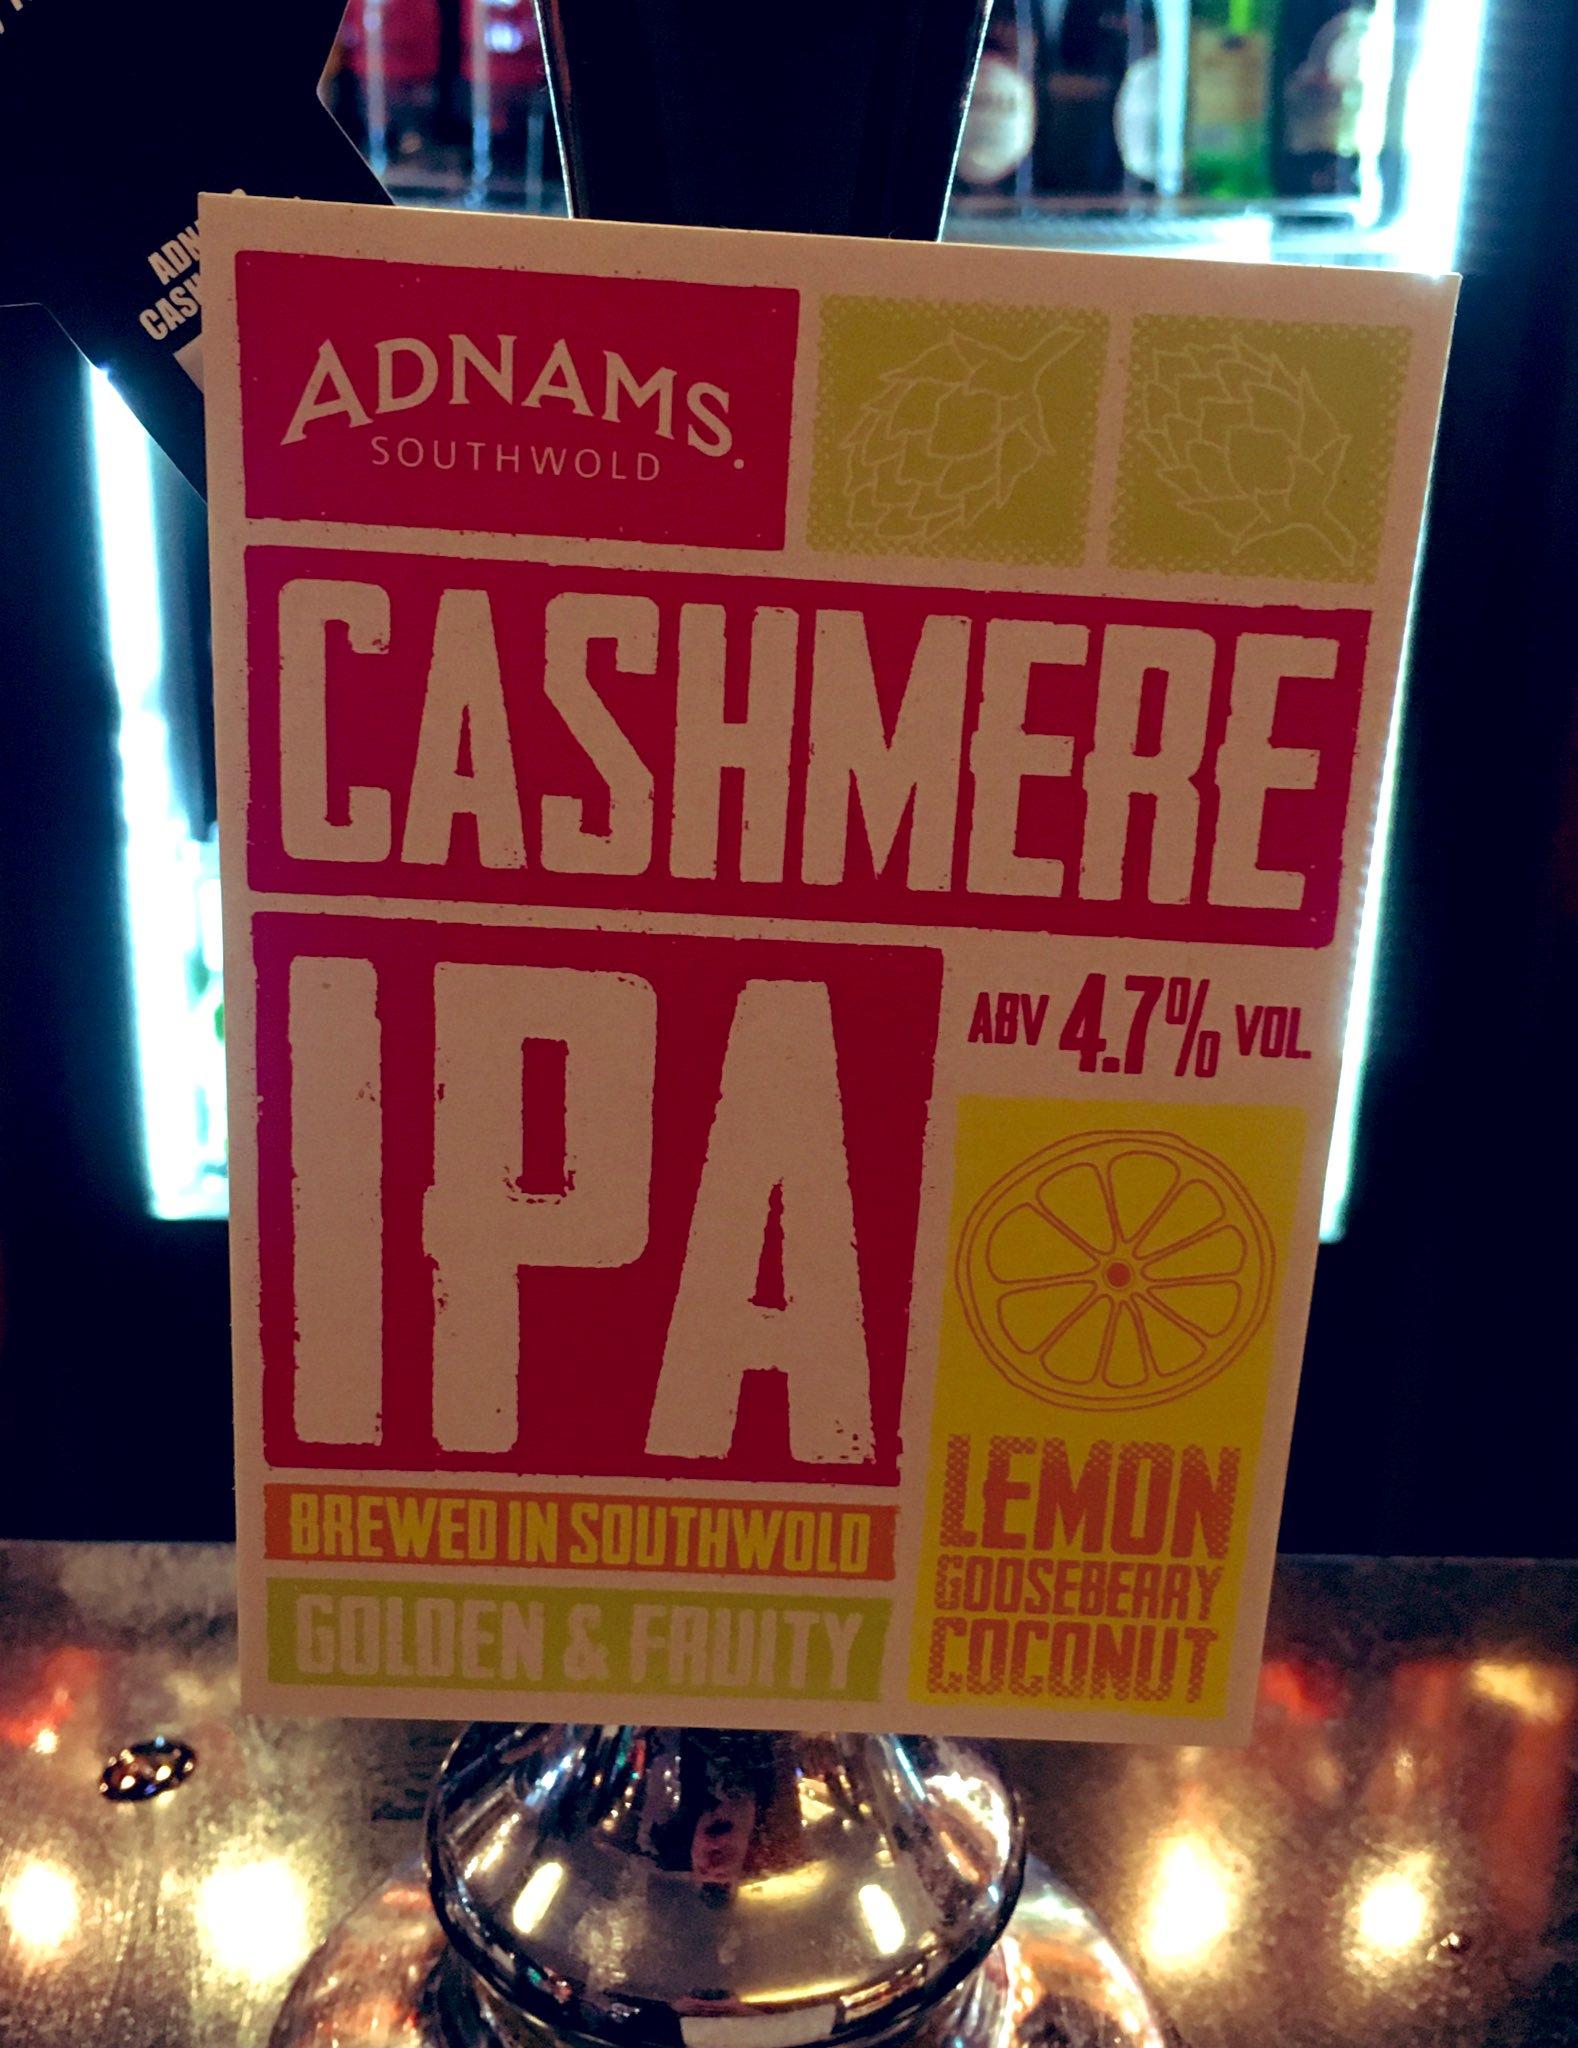 308: Cashmere IPA